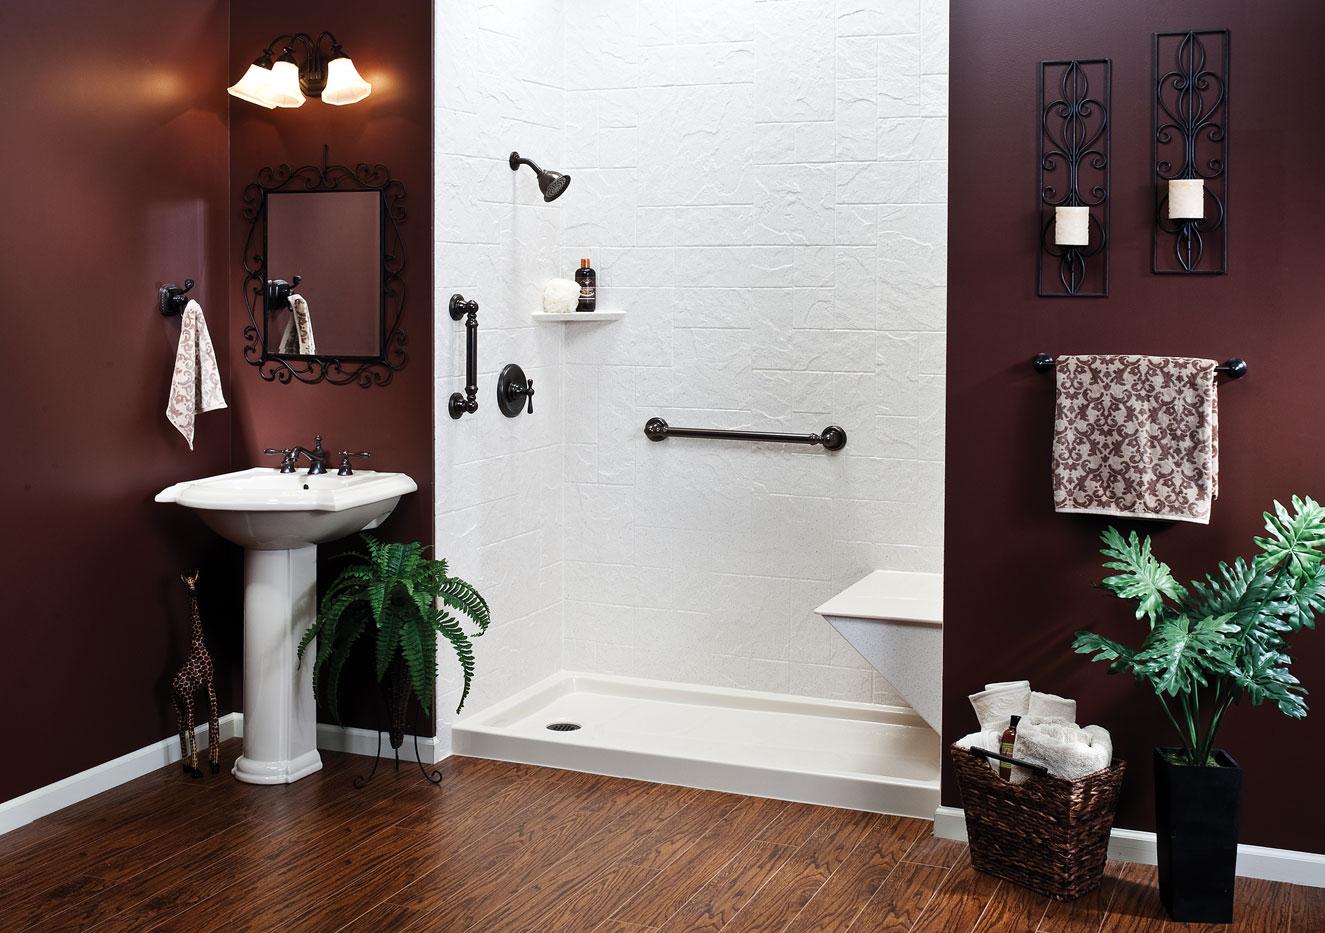 San antonio bathroom remodel - Shower Renovation